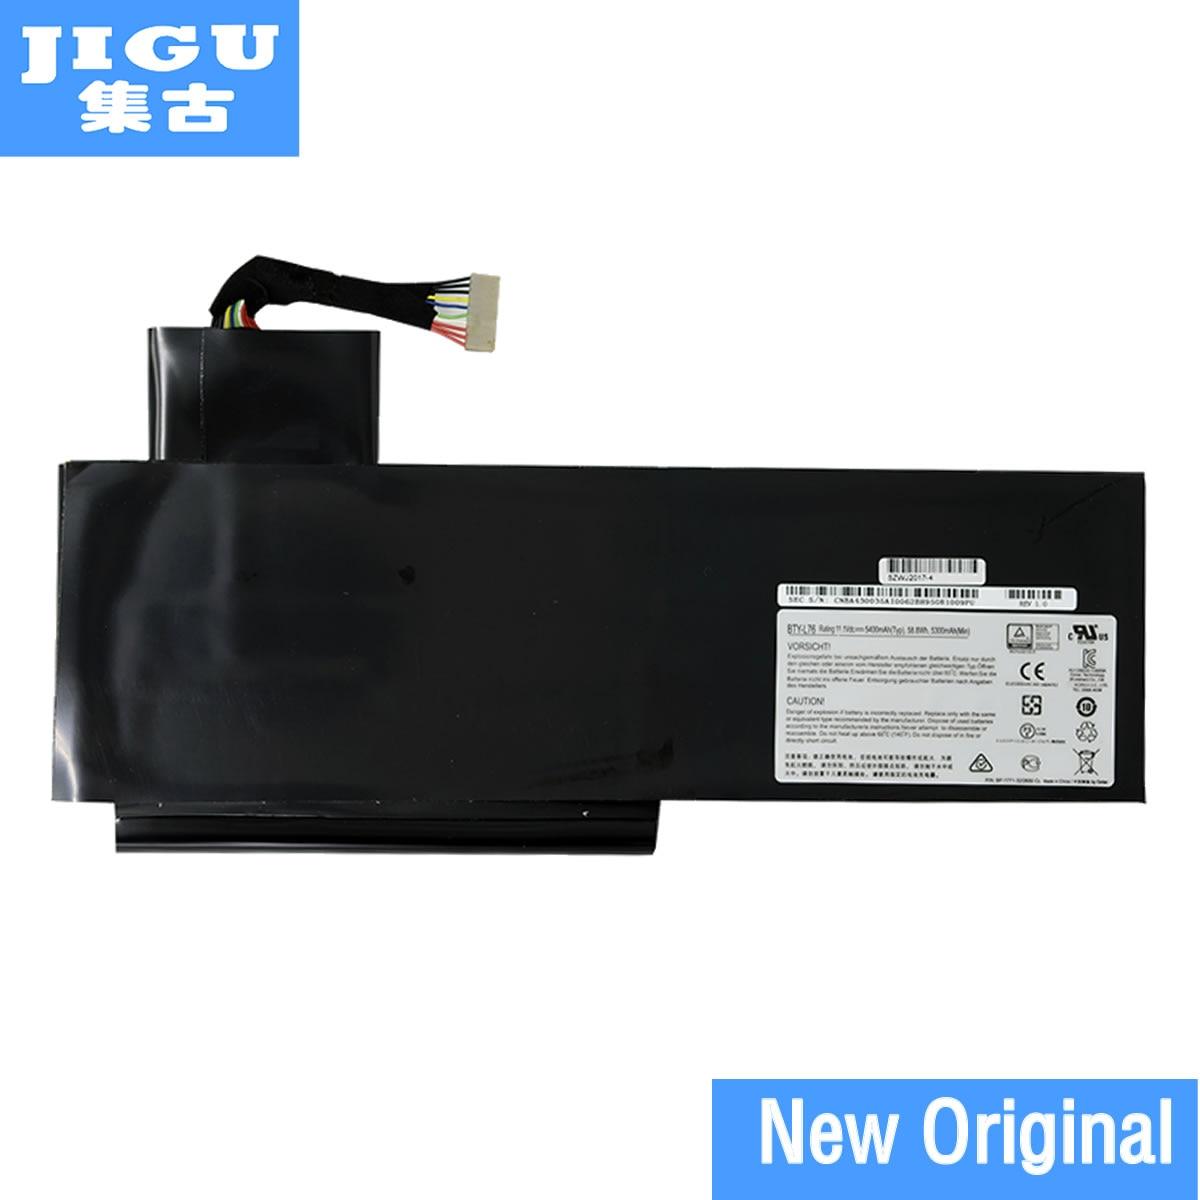 JIGU BTY-L76 MS-1771 الأصلي بطارية كمبيوتر محمول ل MSI GS70 2 قطعة 2PE 2QC 2QD 2QE ل ميديون X7613 MD98802 ل هاير 7G-700